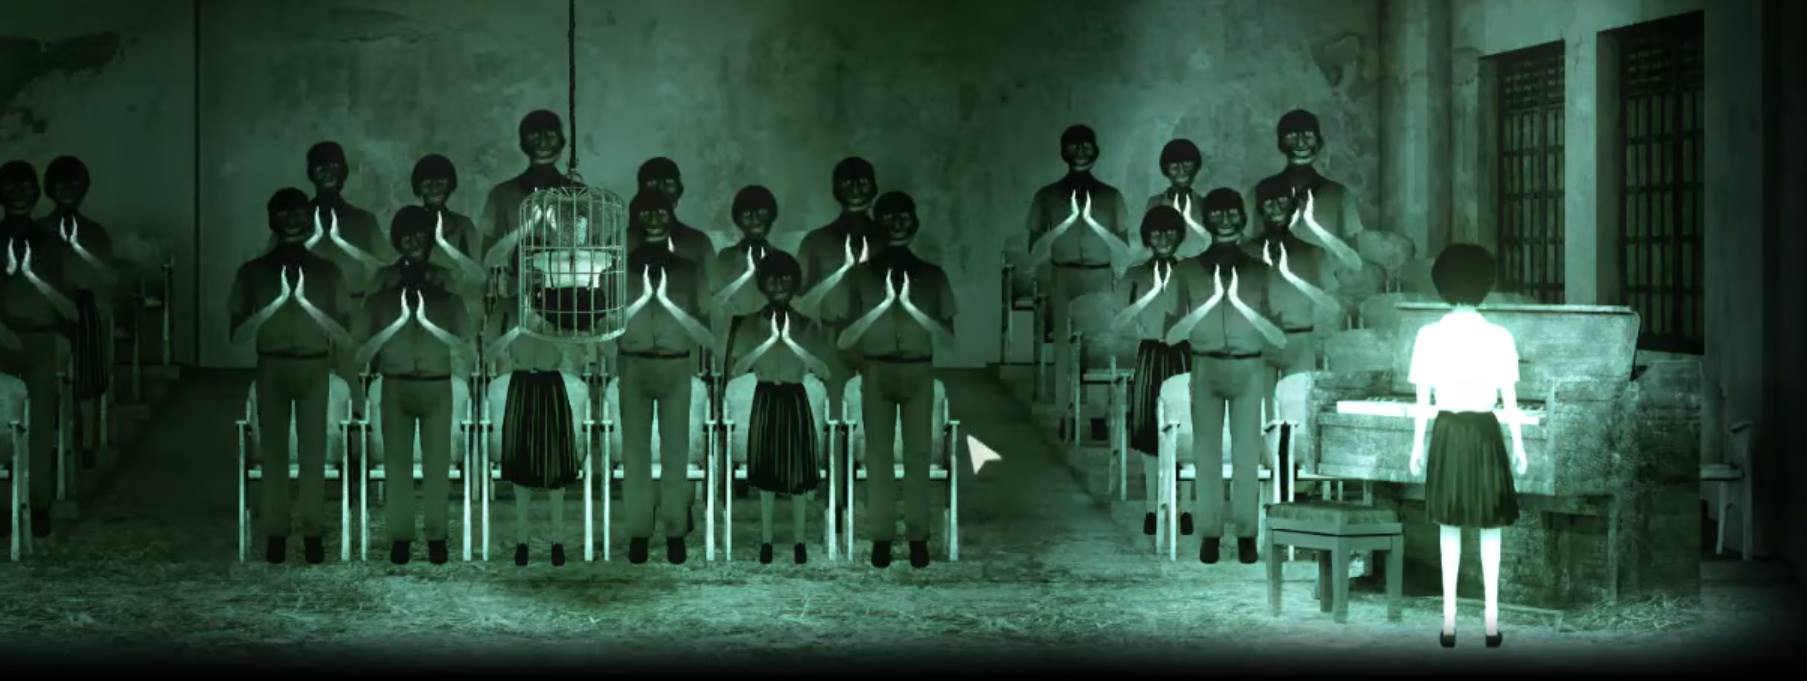 detention-5